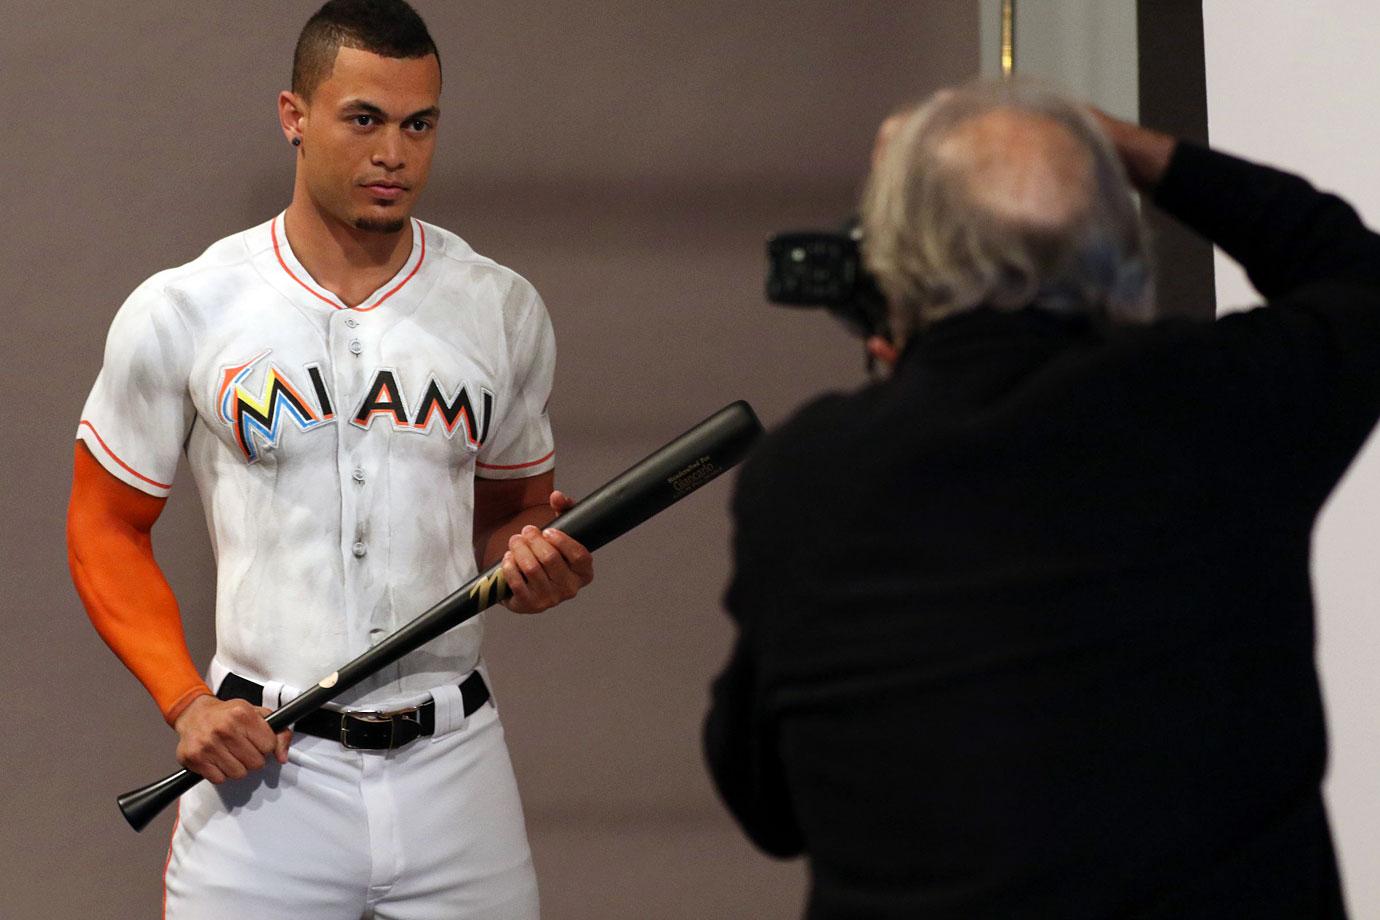 Sports Illustrated: Giancarlo Stanton is MLB's model slugger | SI.com